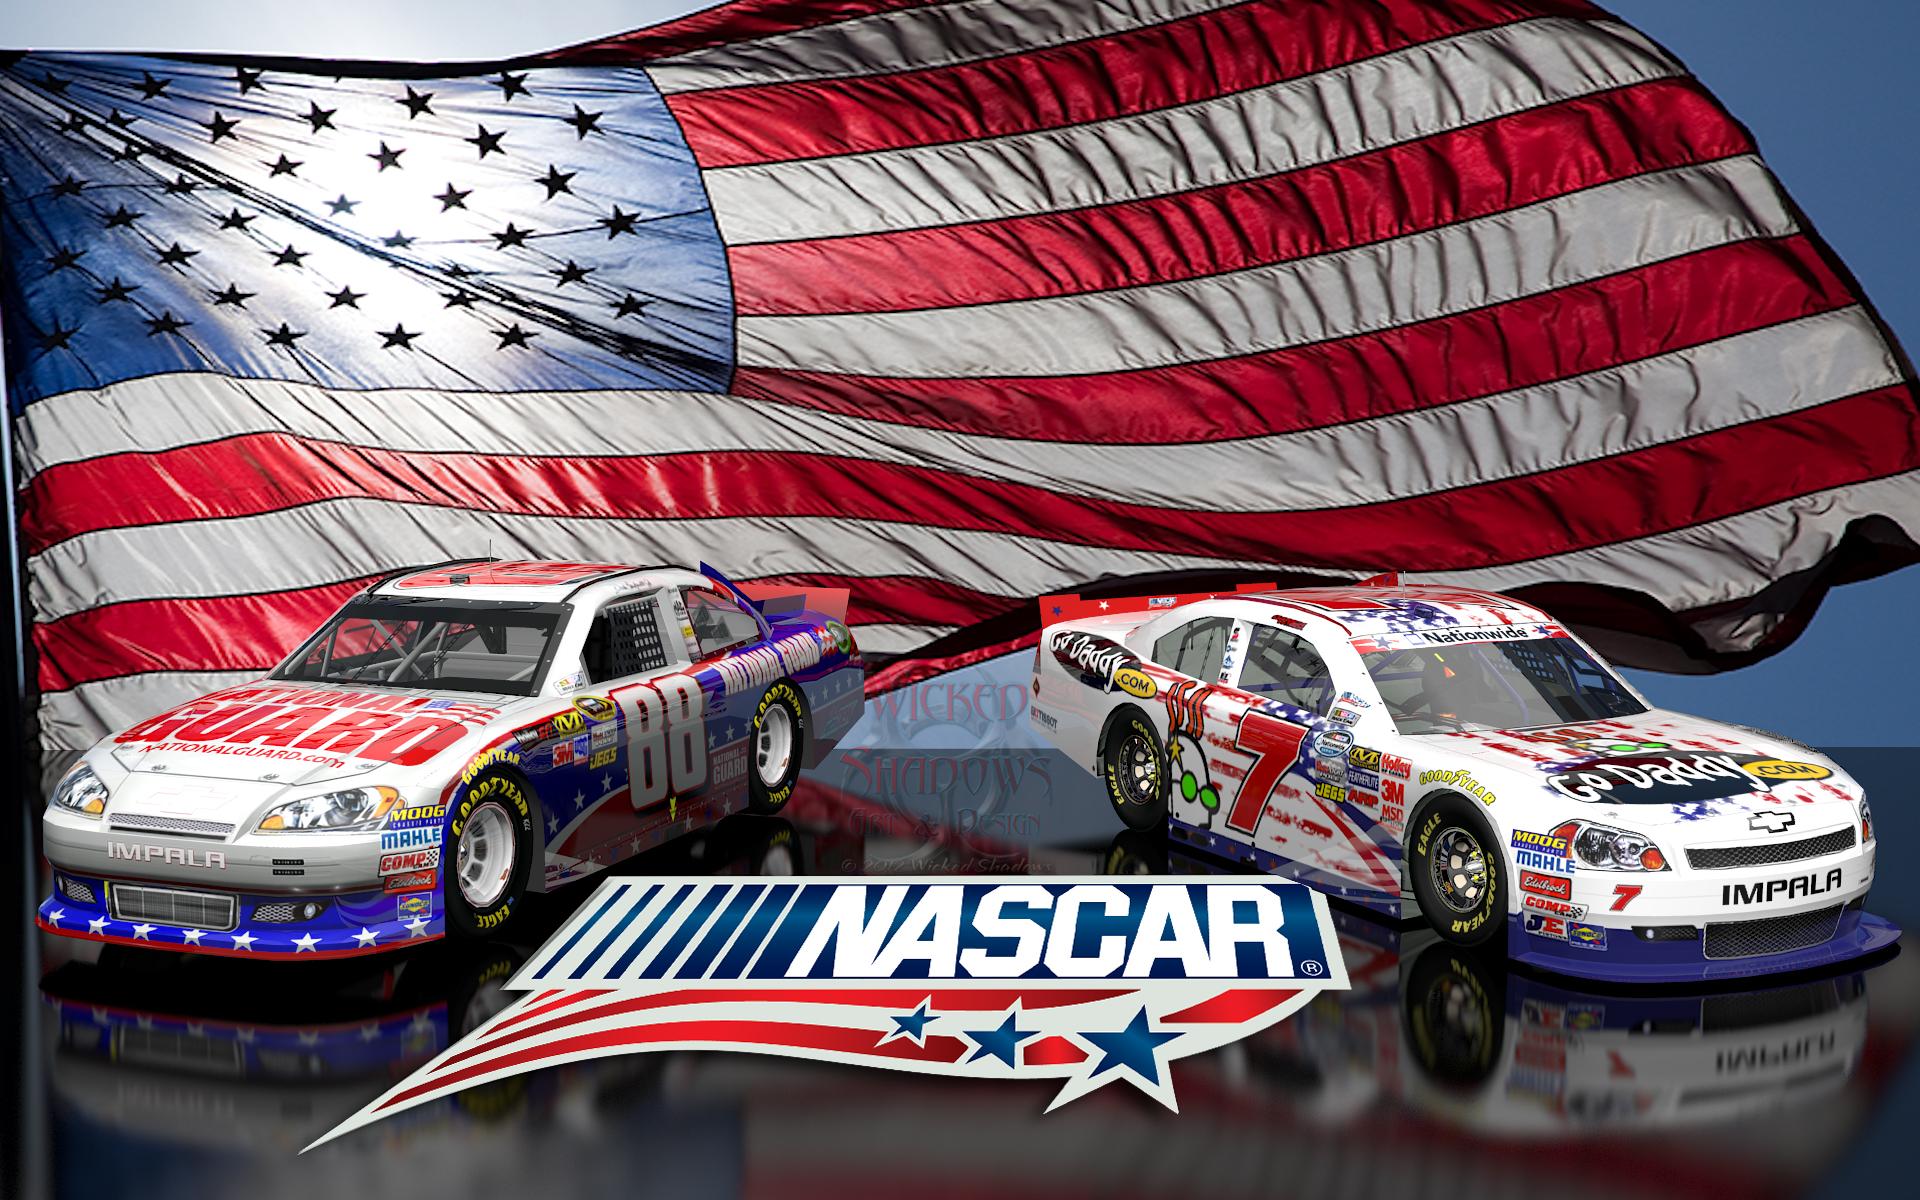 Danica Patrick Dale Earnhardt Jr NASCAR Unites wallpaper 16x10